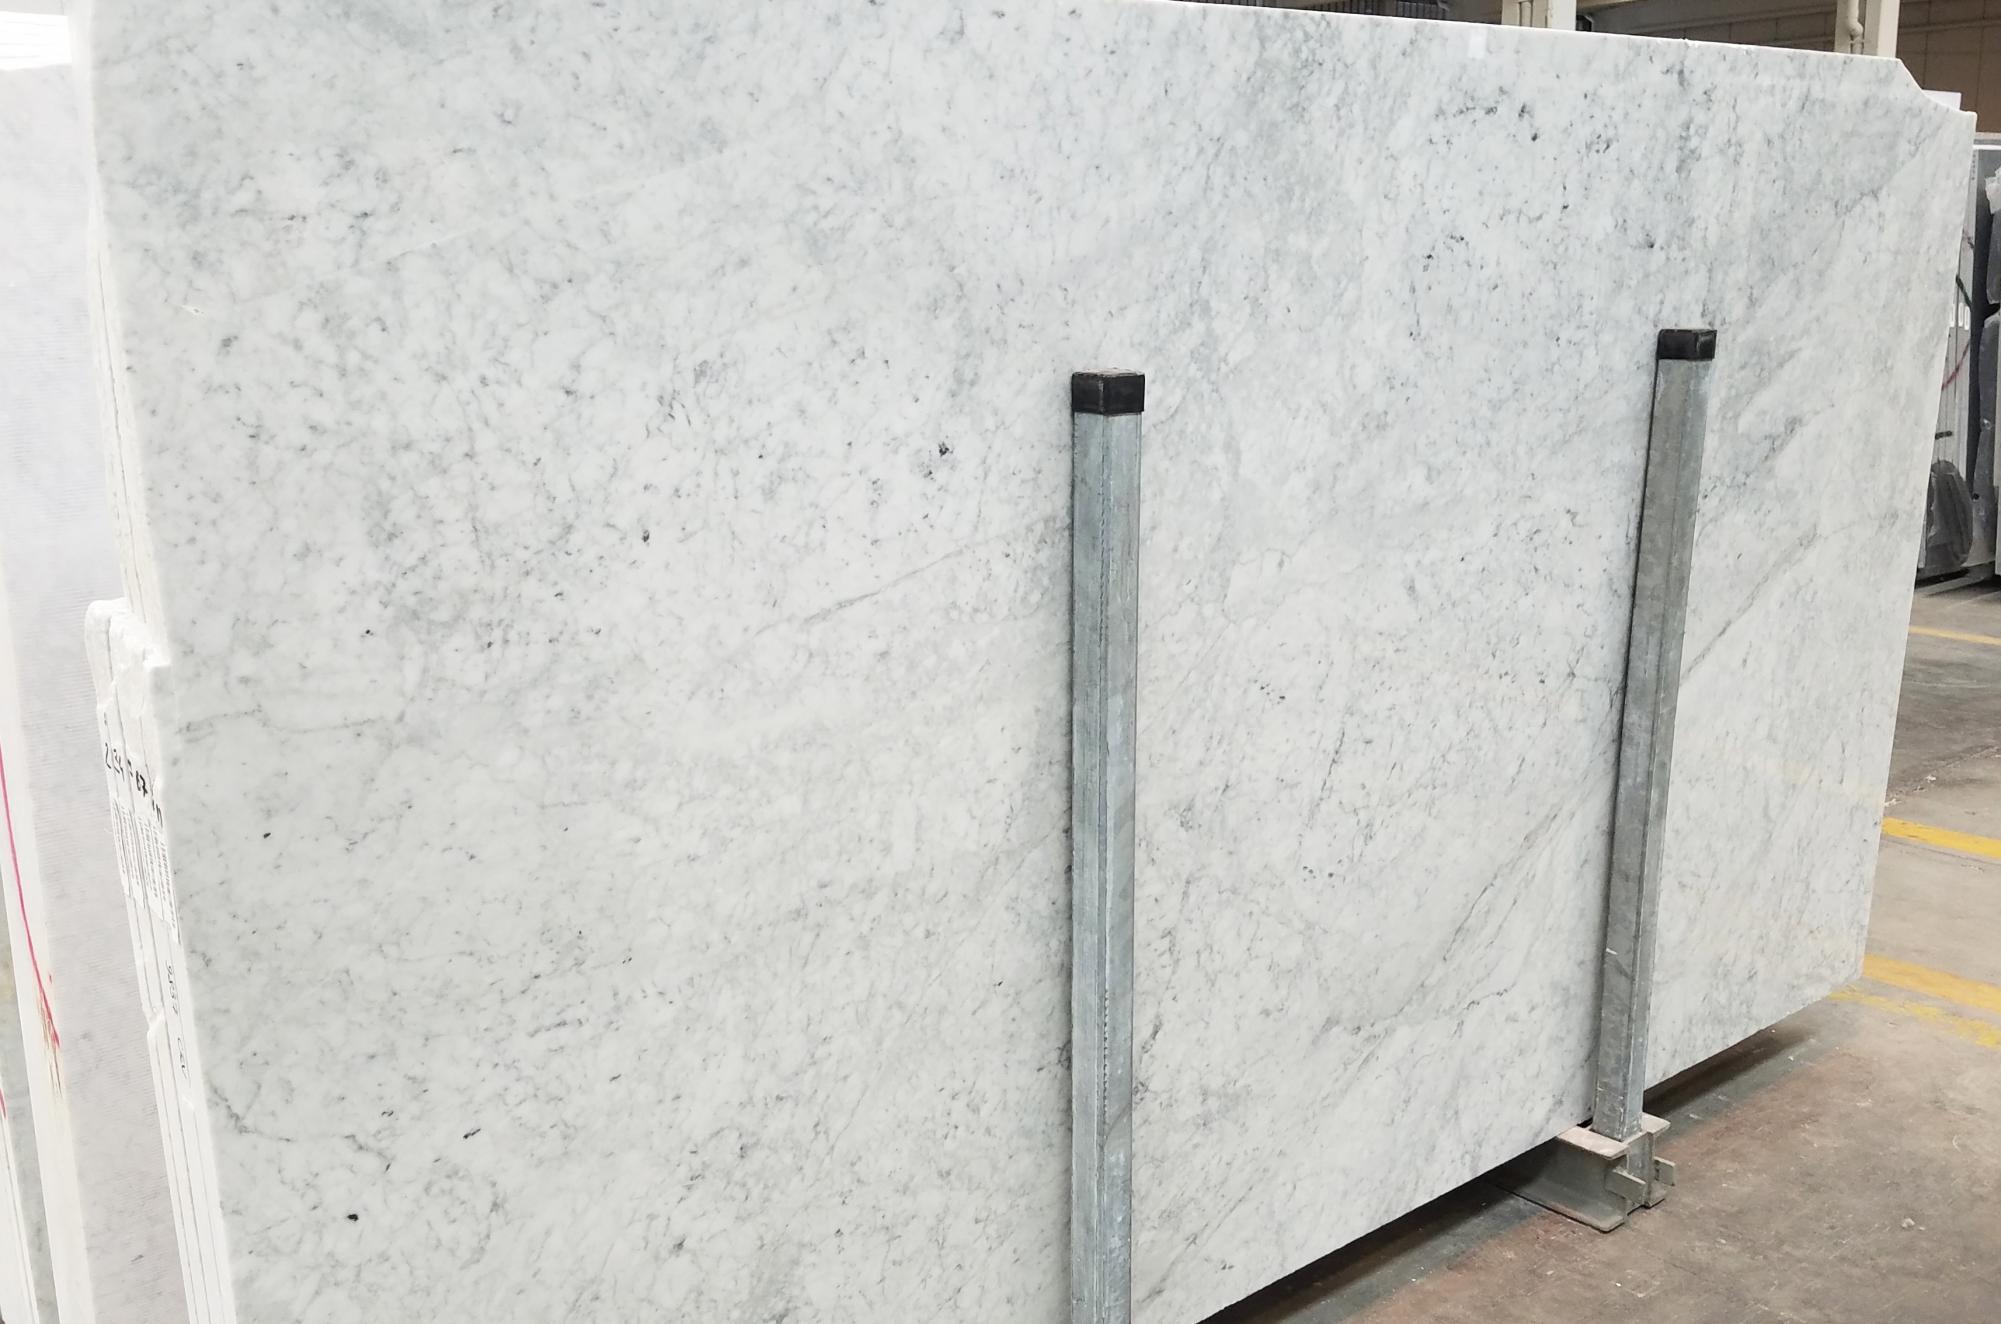 CARRARA Supply Veneto (Italy) polished slabs 1693M , SL3CM natural marble